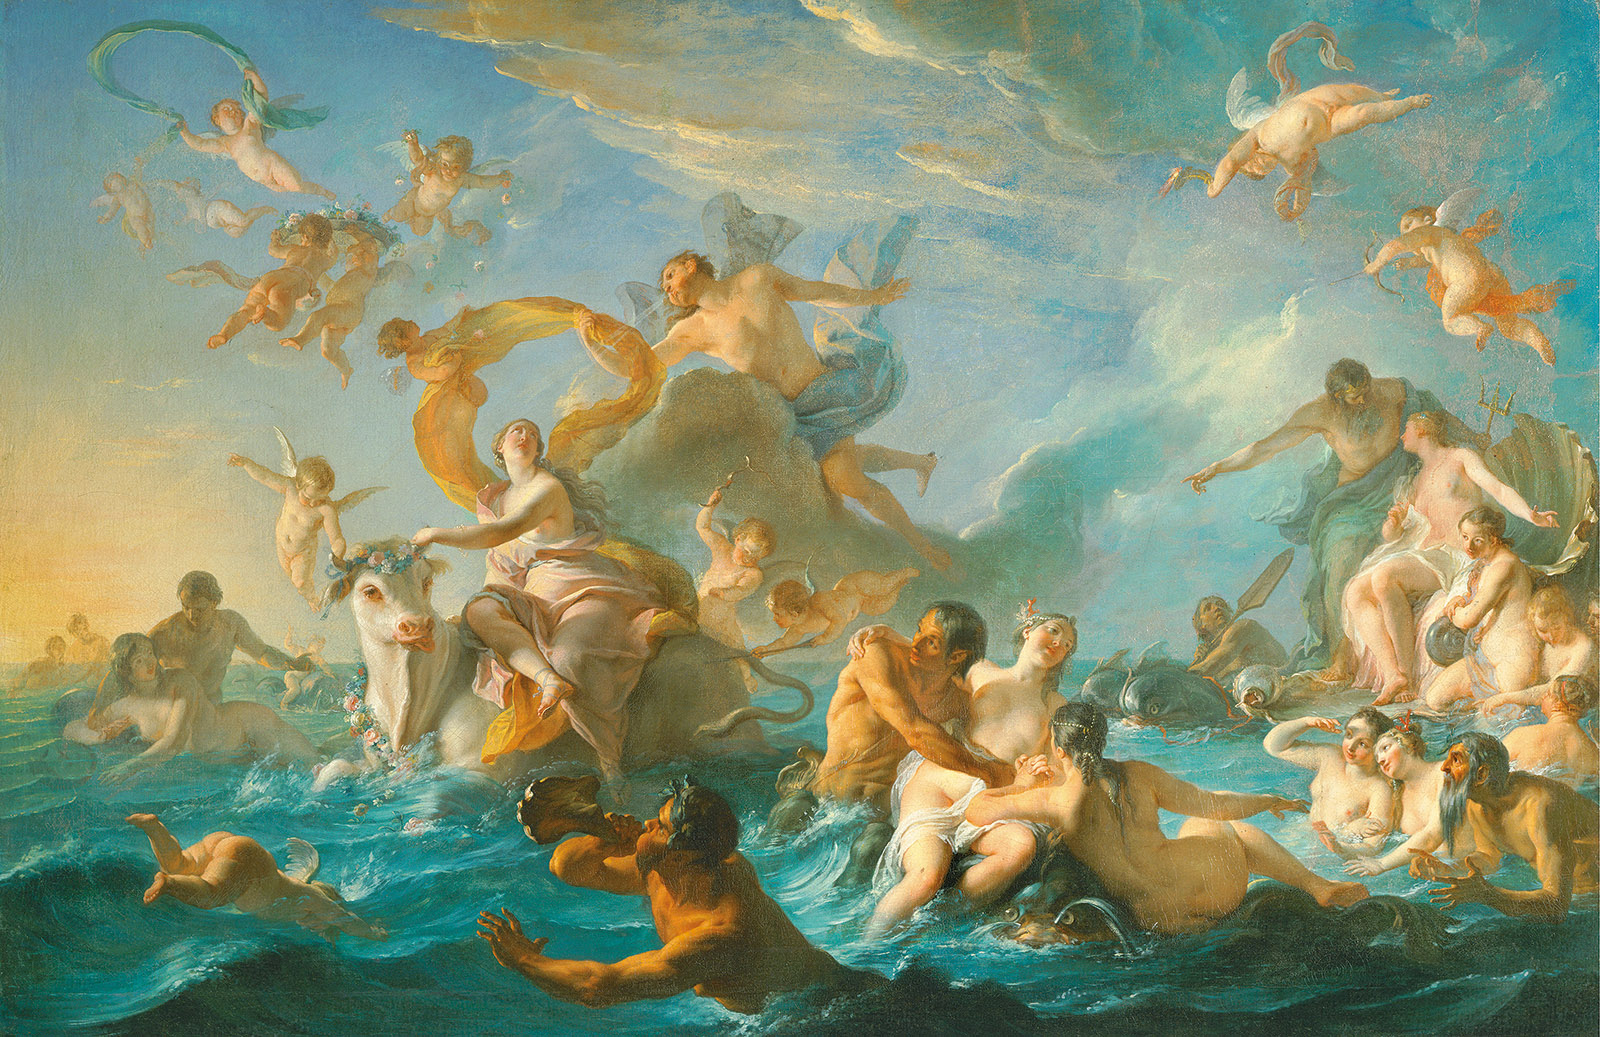 Noël-Nicolas Coypel: The Abduction of Europa, 1726–1727